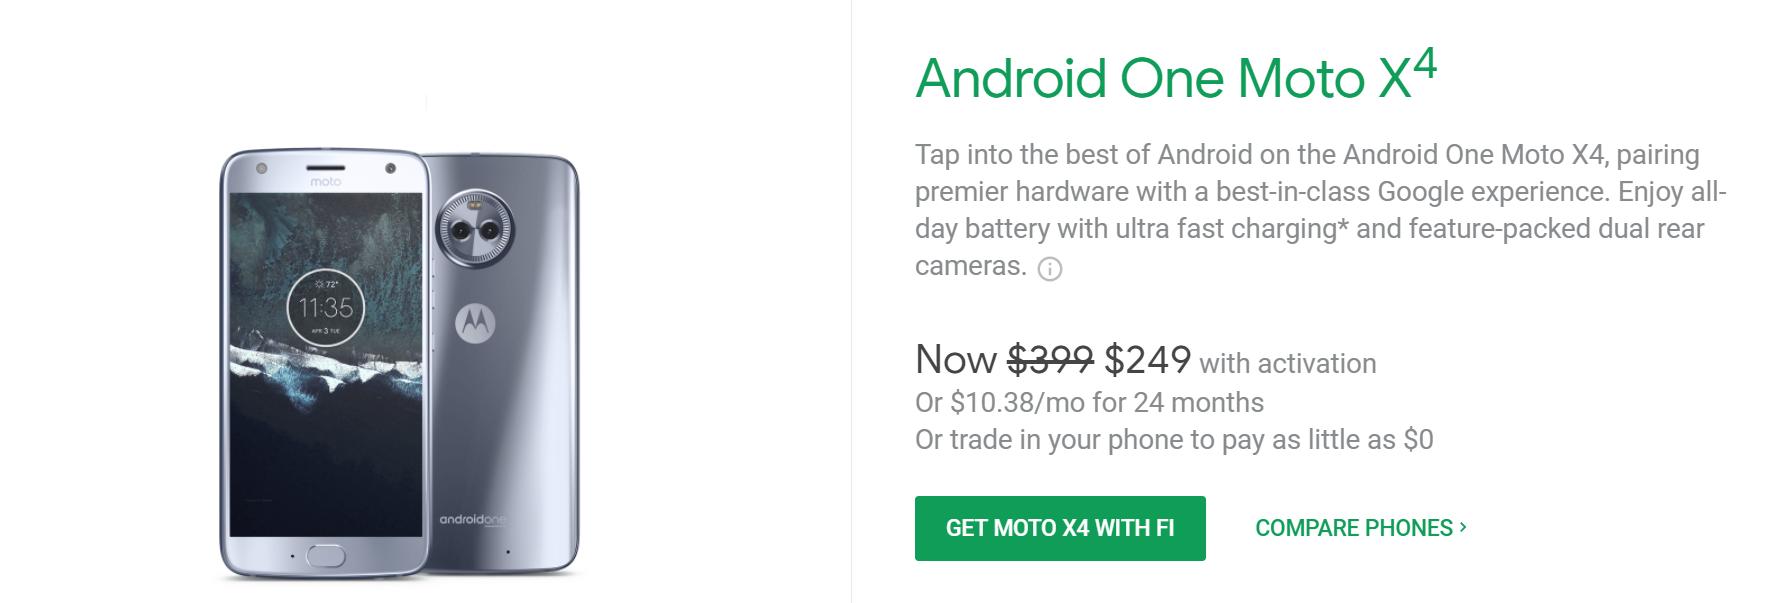 Moto X4 Android Одна цена